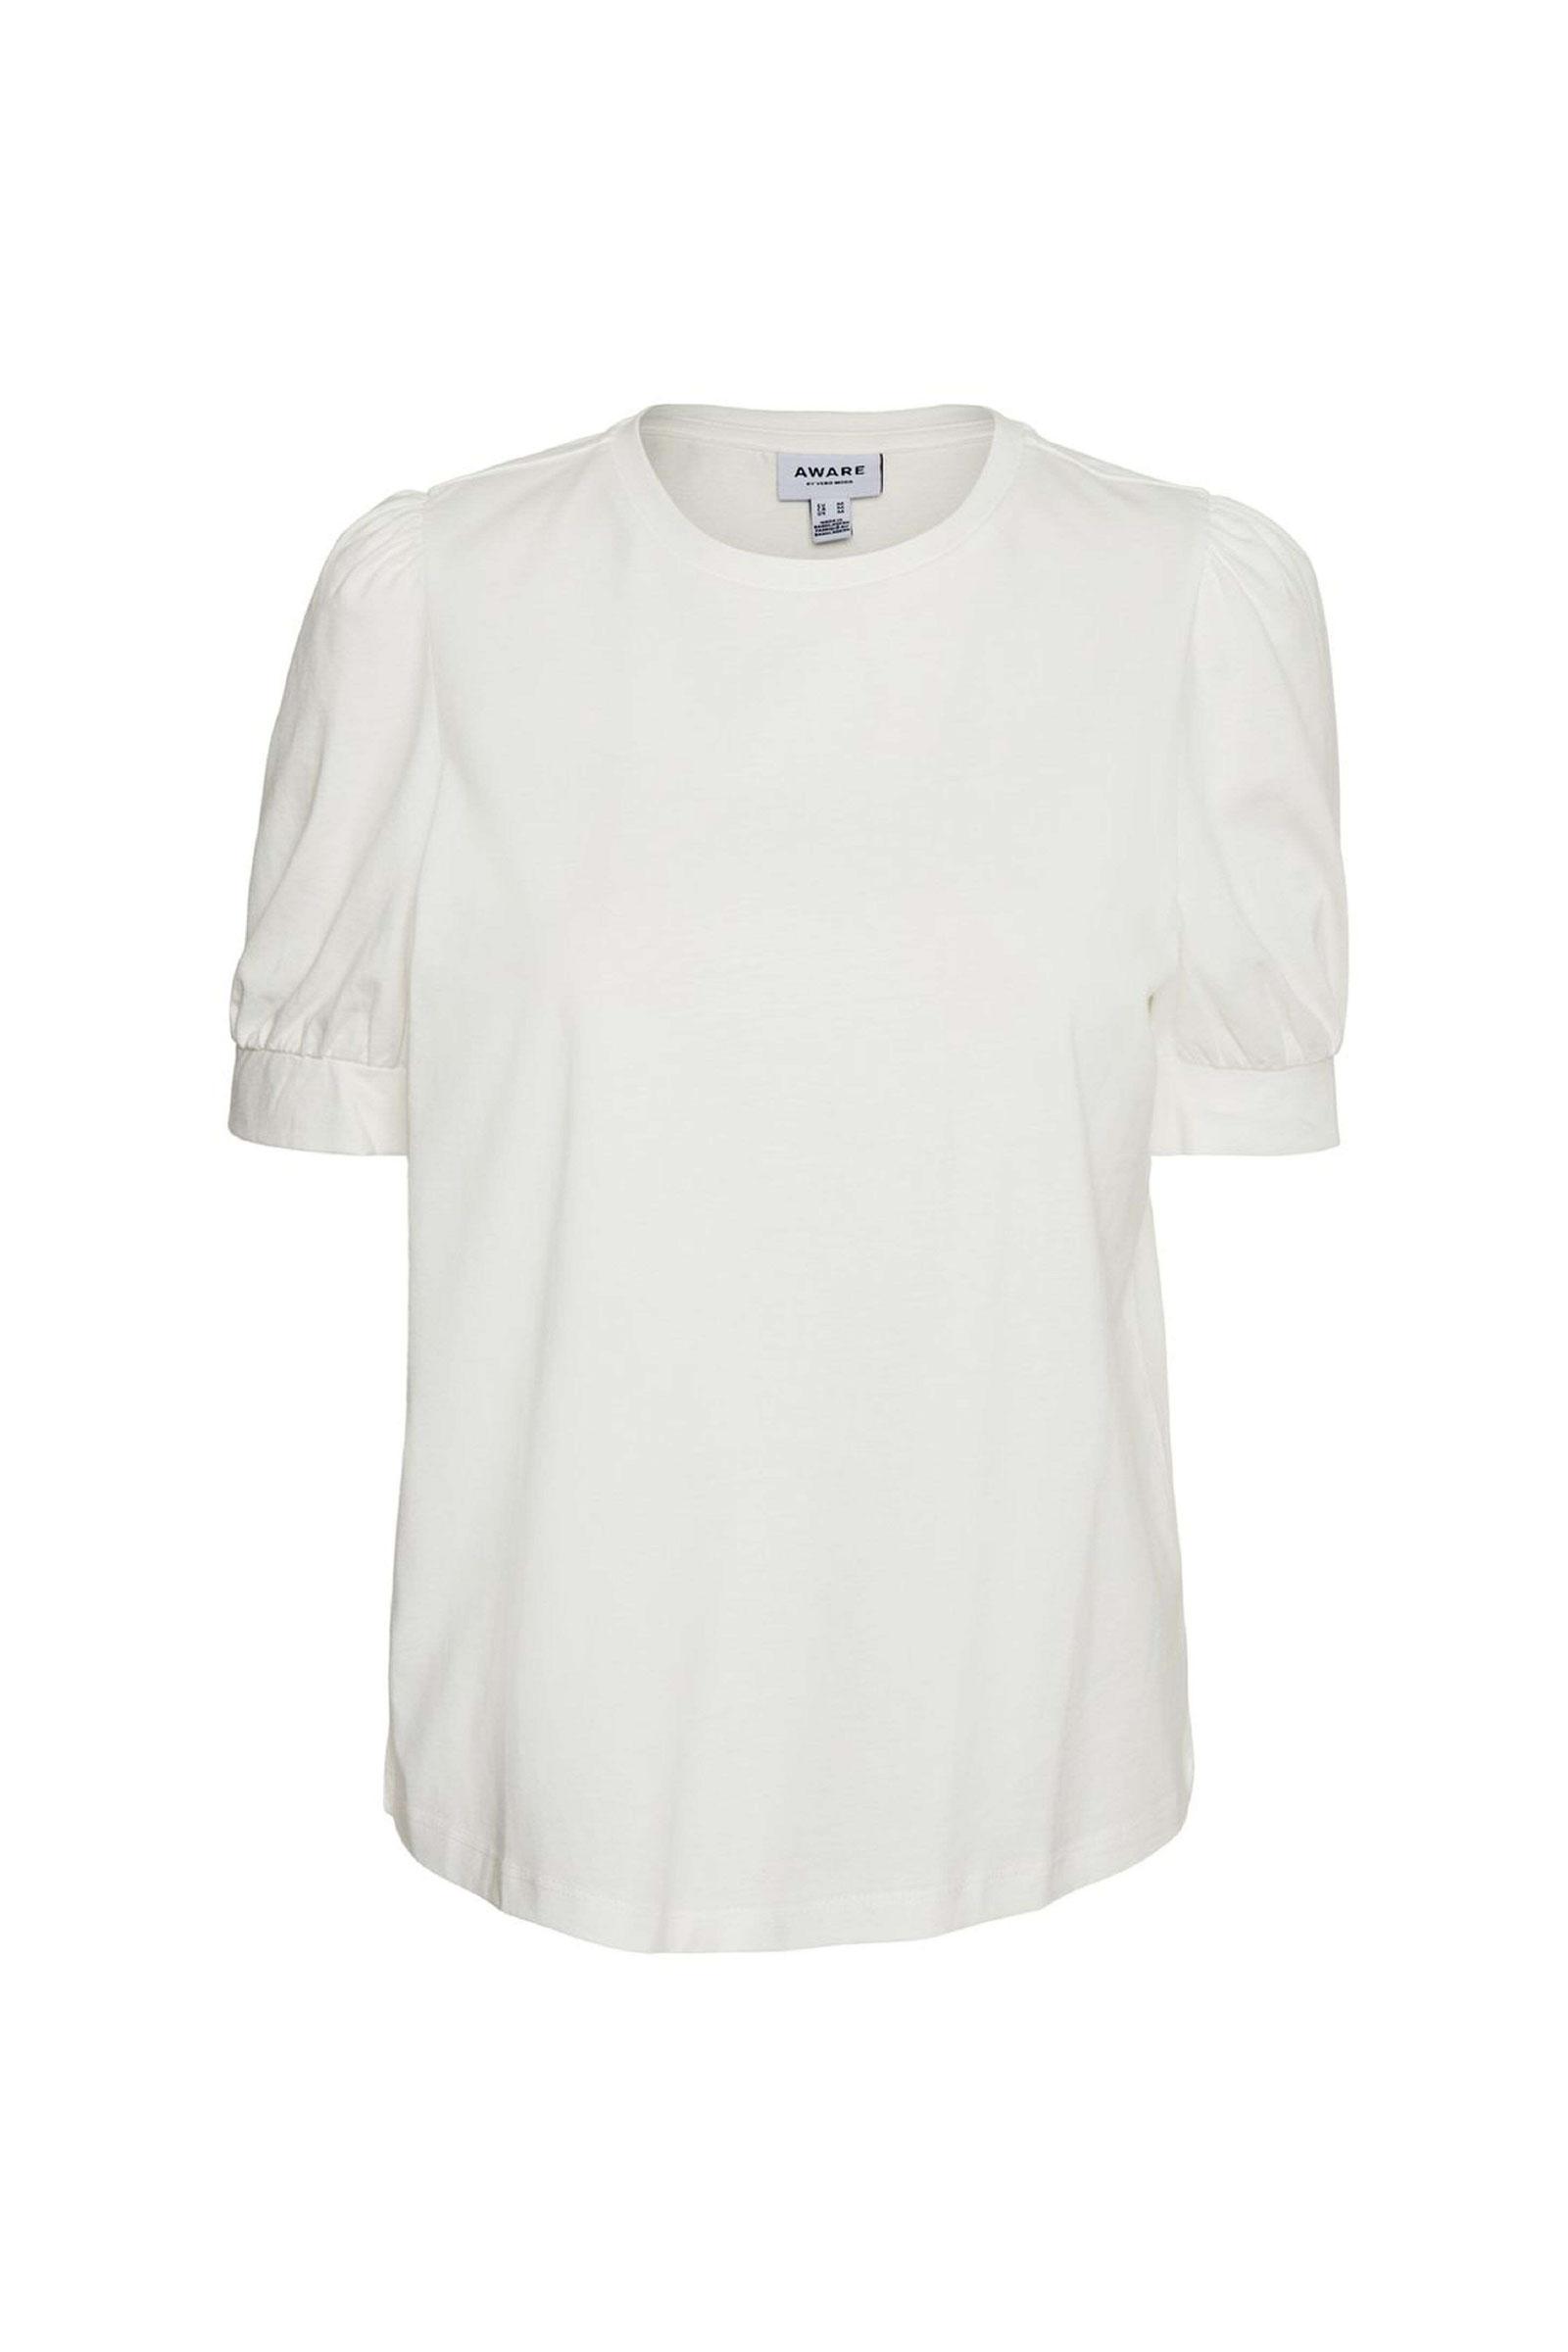 VERO MODA Women's T-Shirt VERO MODA | T-Shirt | 10243967Snow White